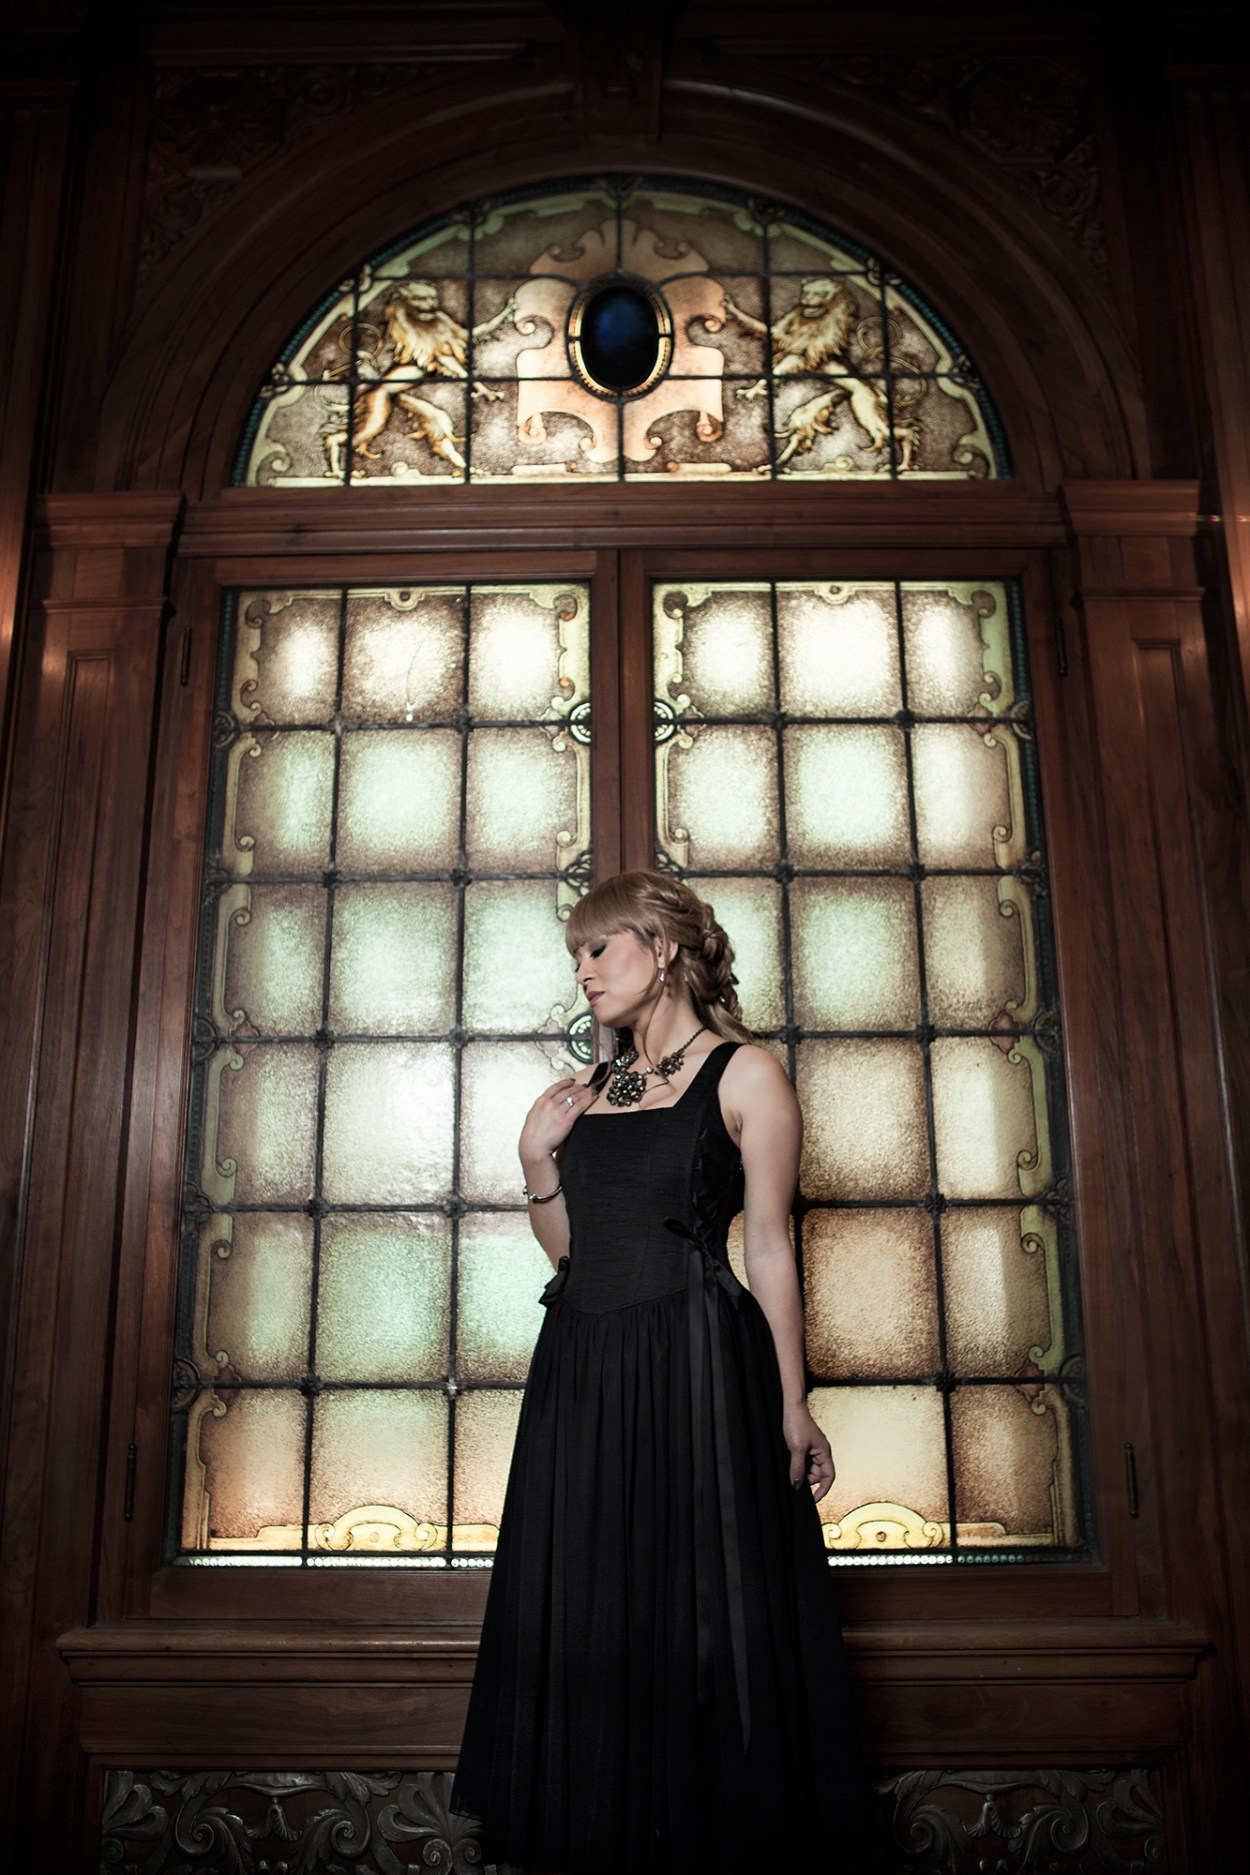 16-Elements-H-Lolita-Stlye-Fashion-Elegant-Gothic